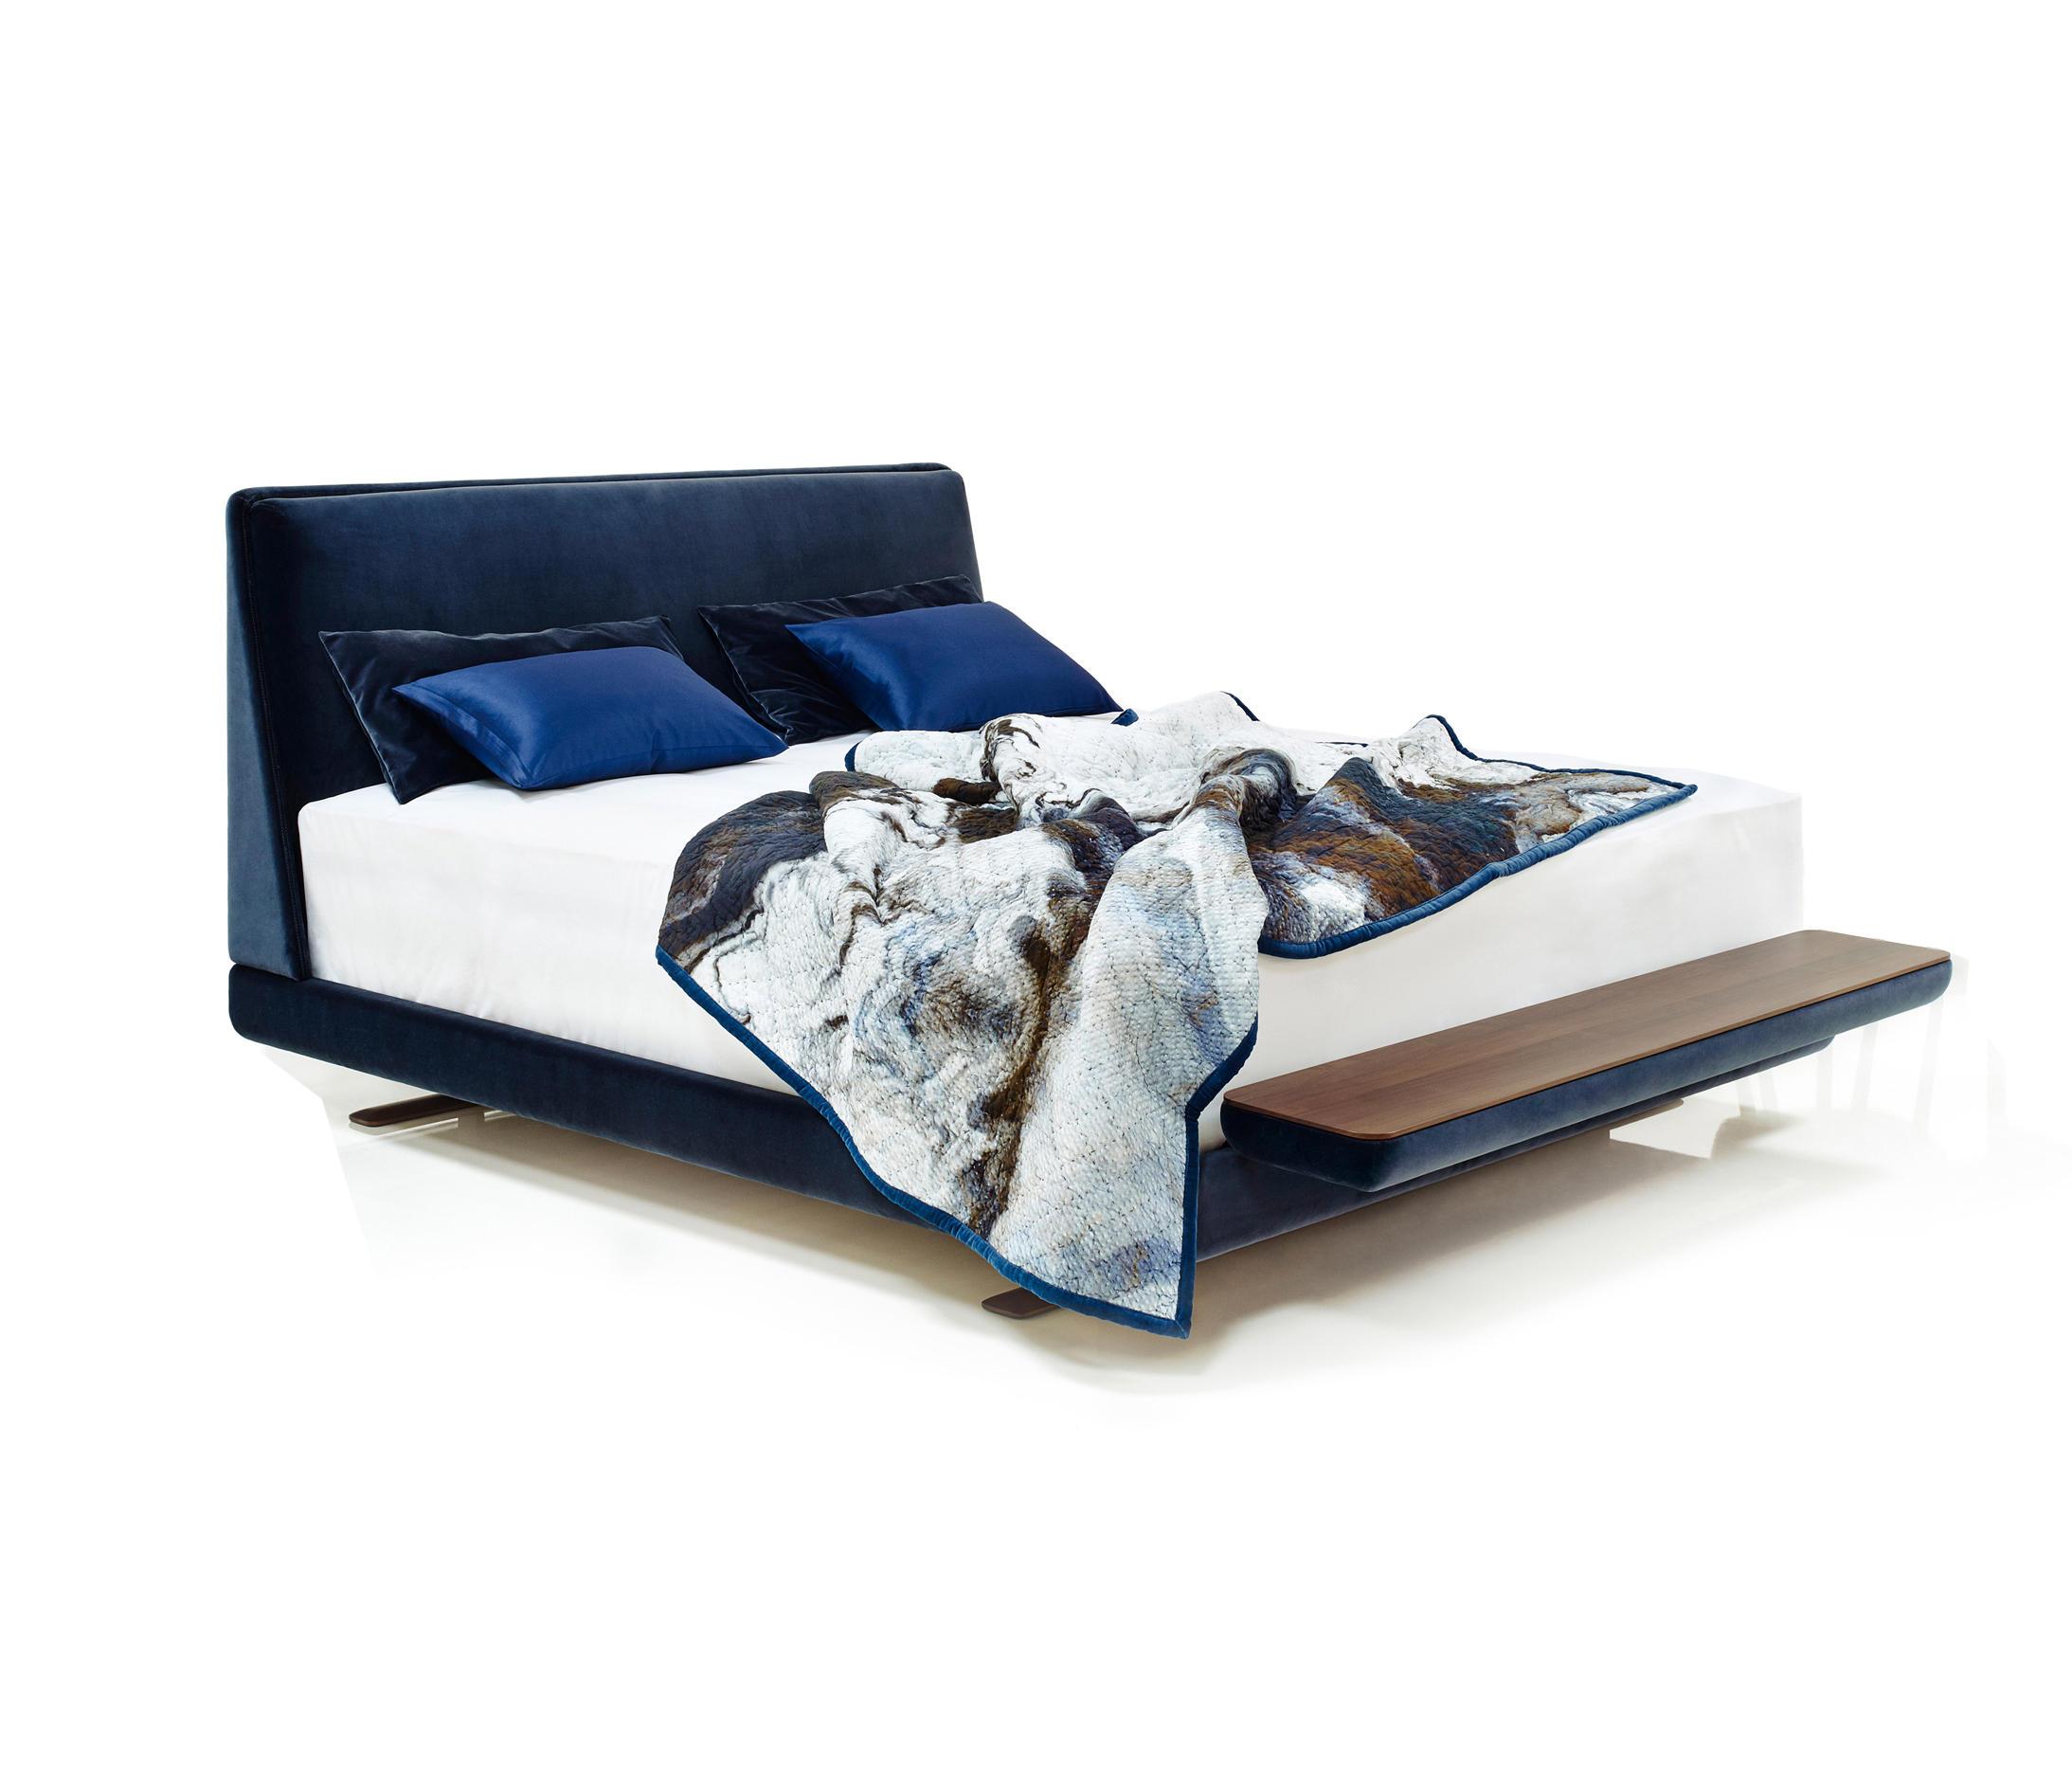 MAXIME - Betten von Wittmann | Architonic